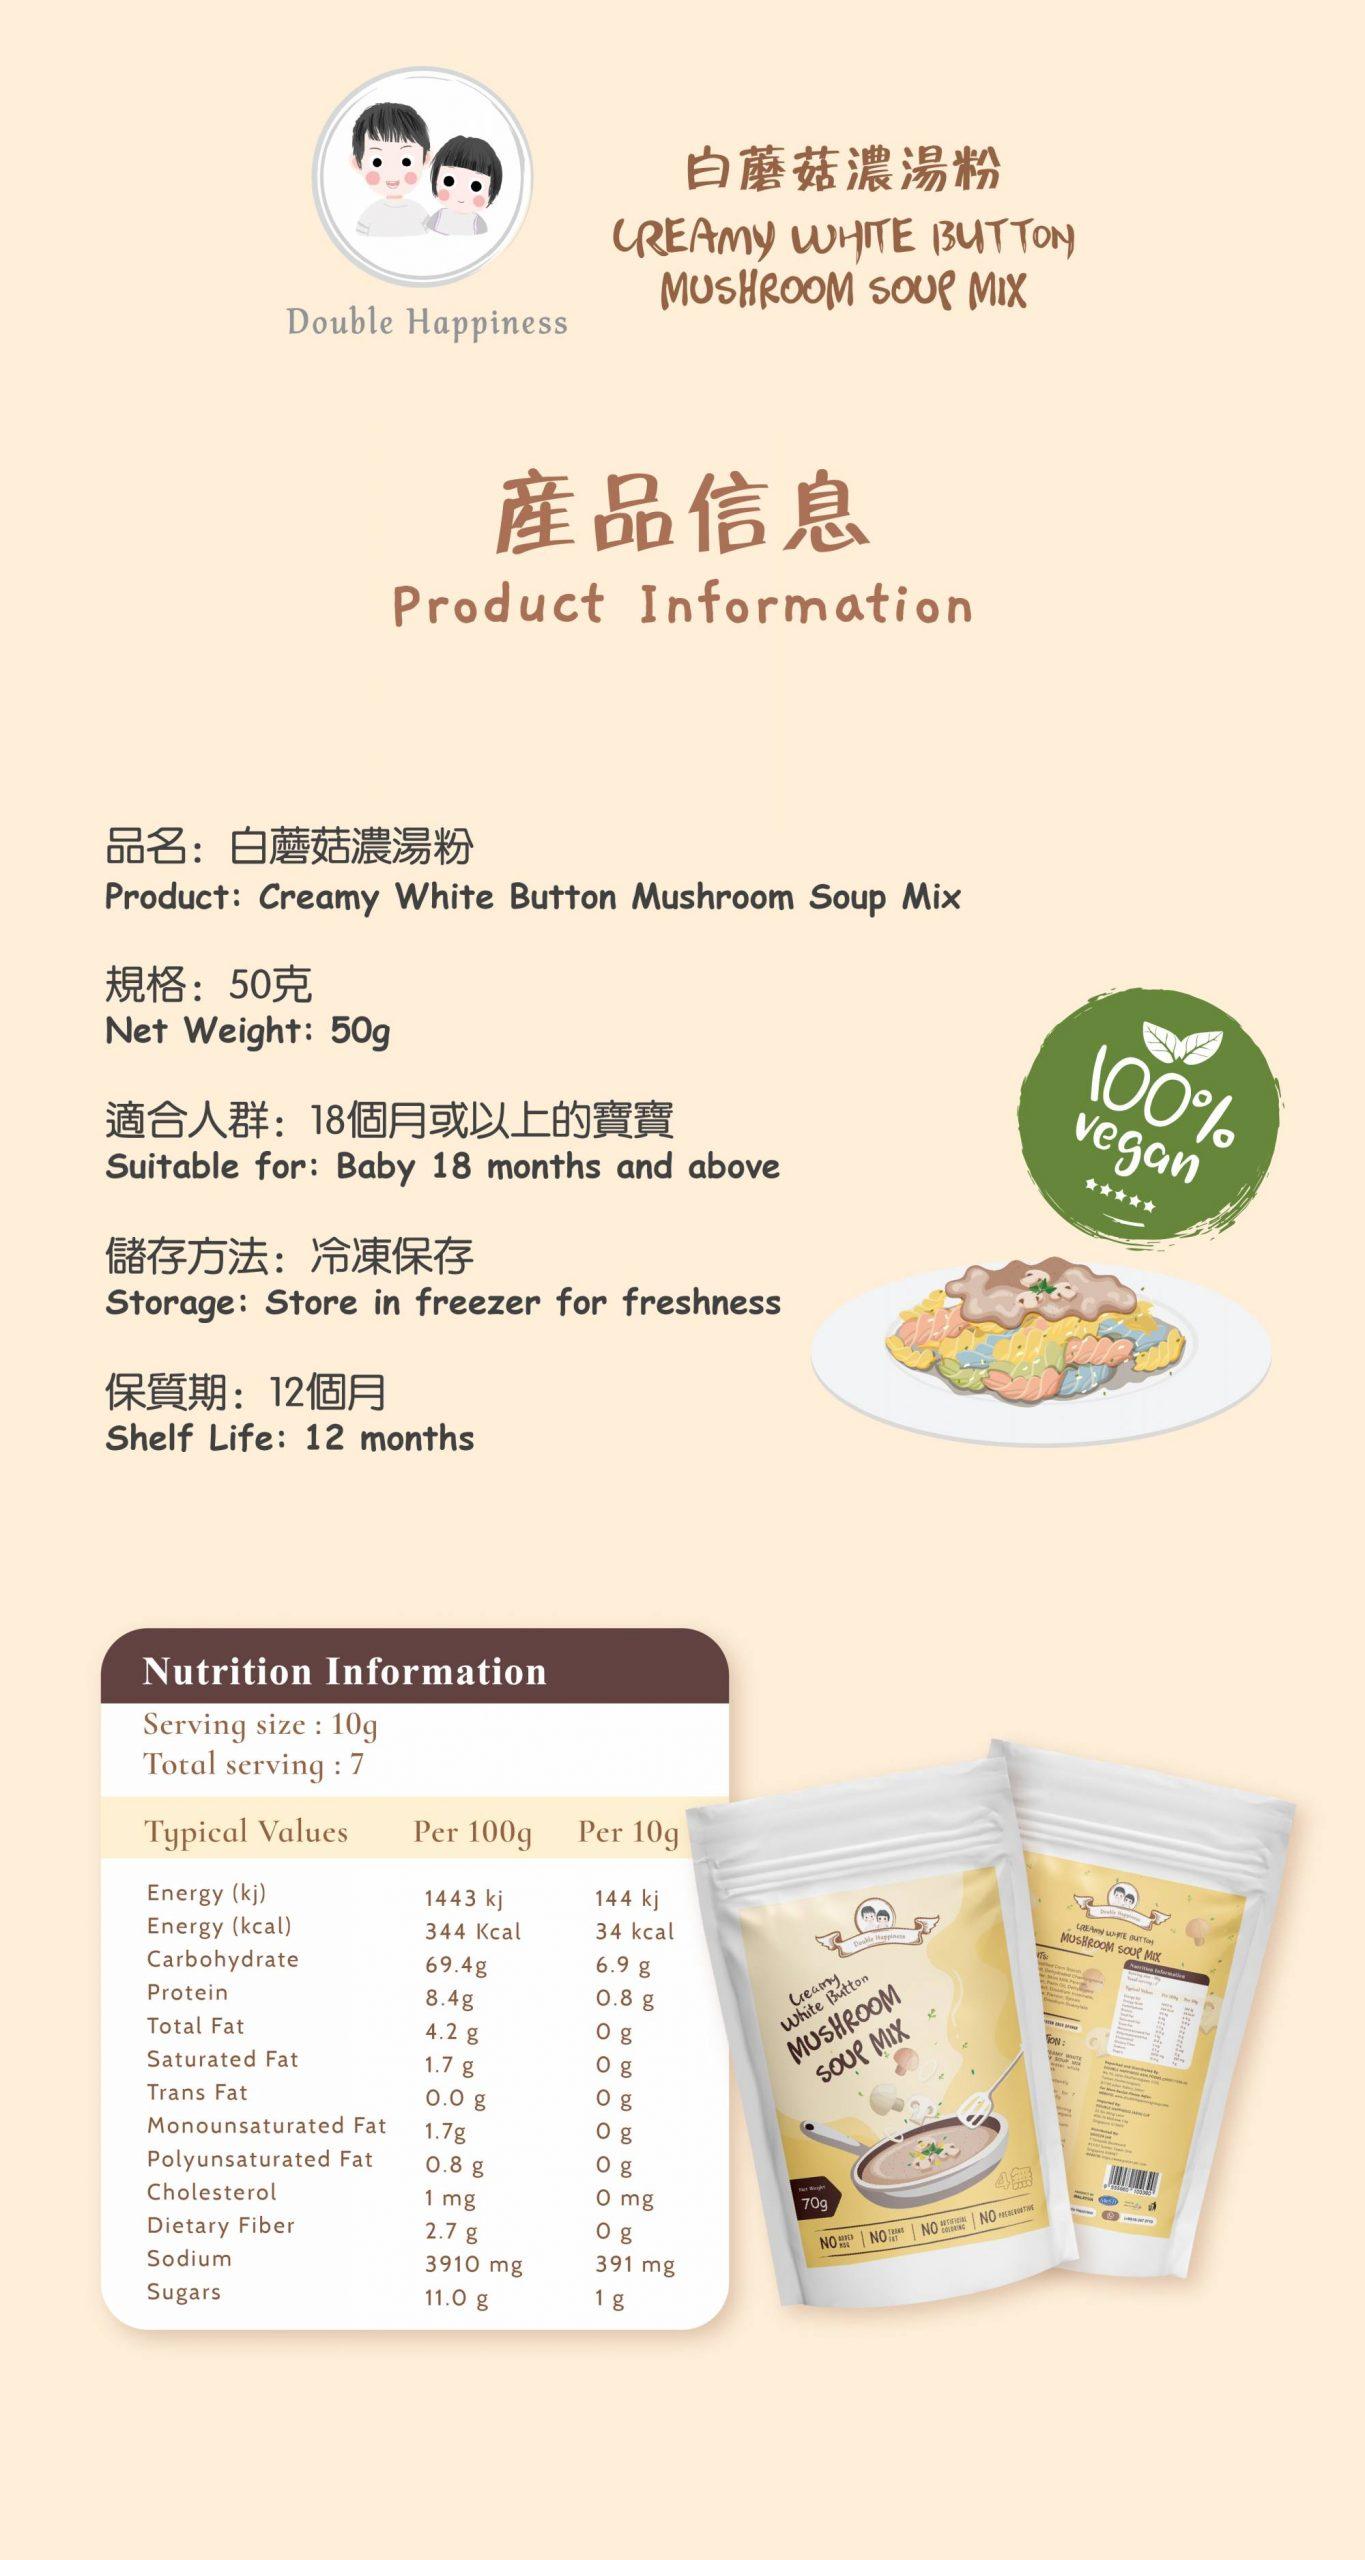 Creamy Mushroom Soup product information